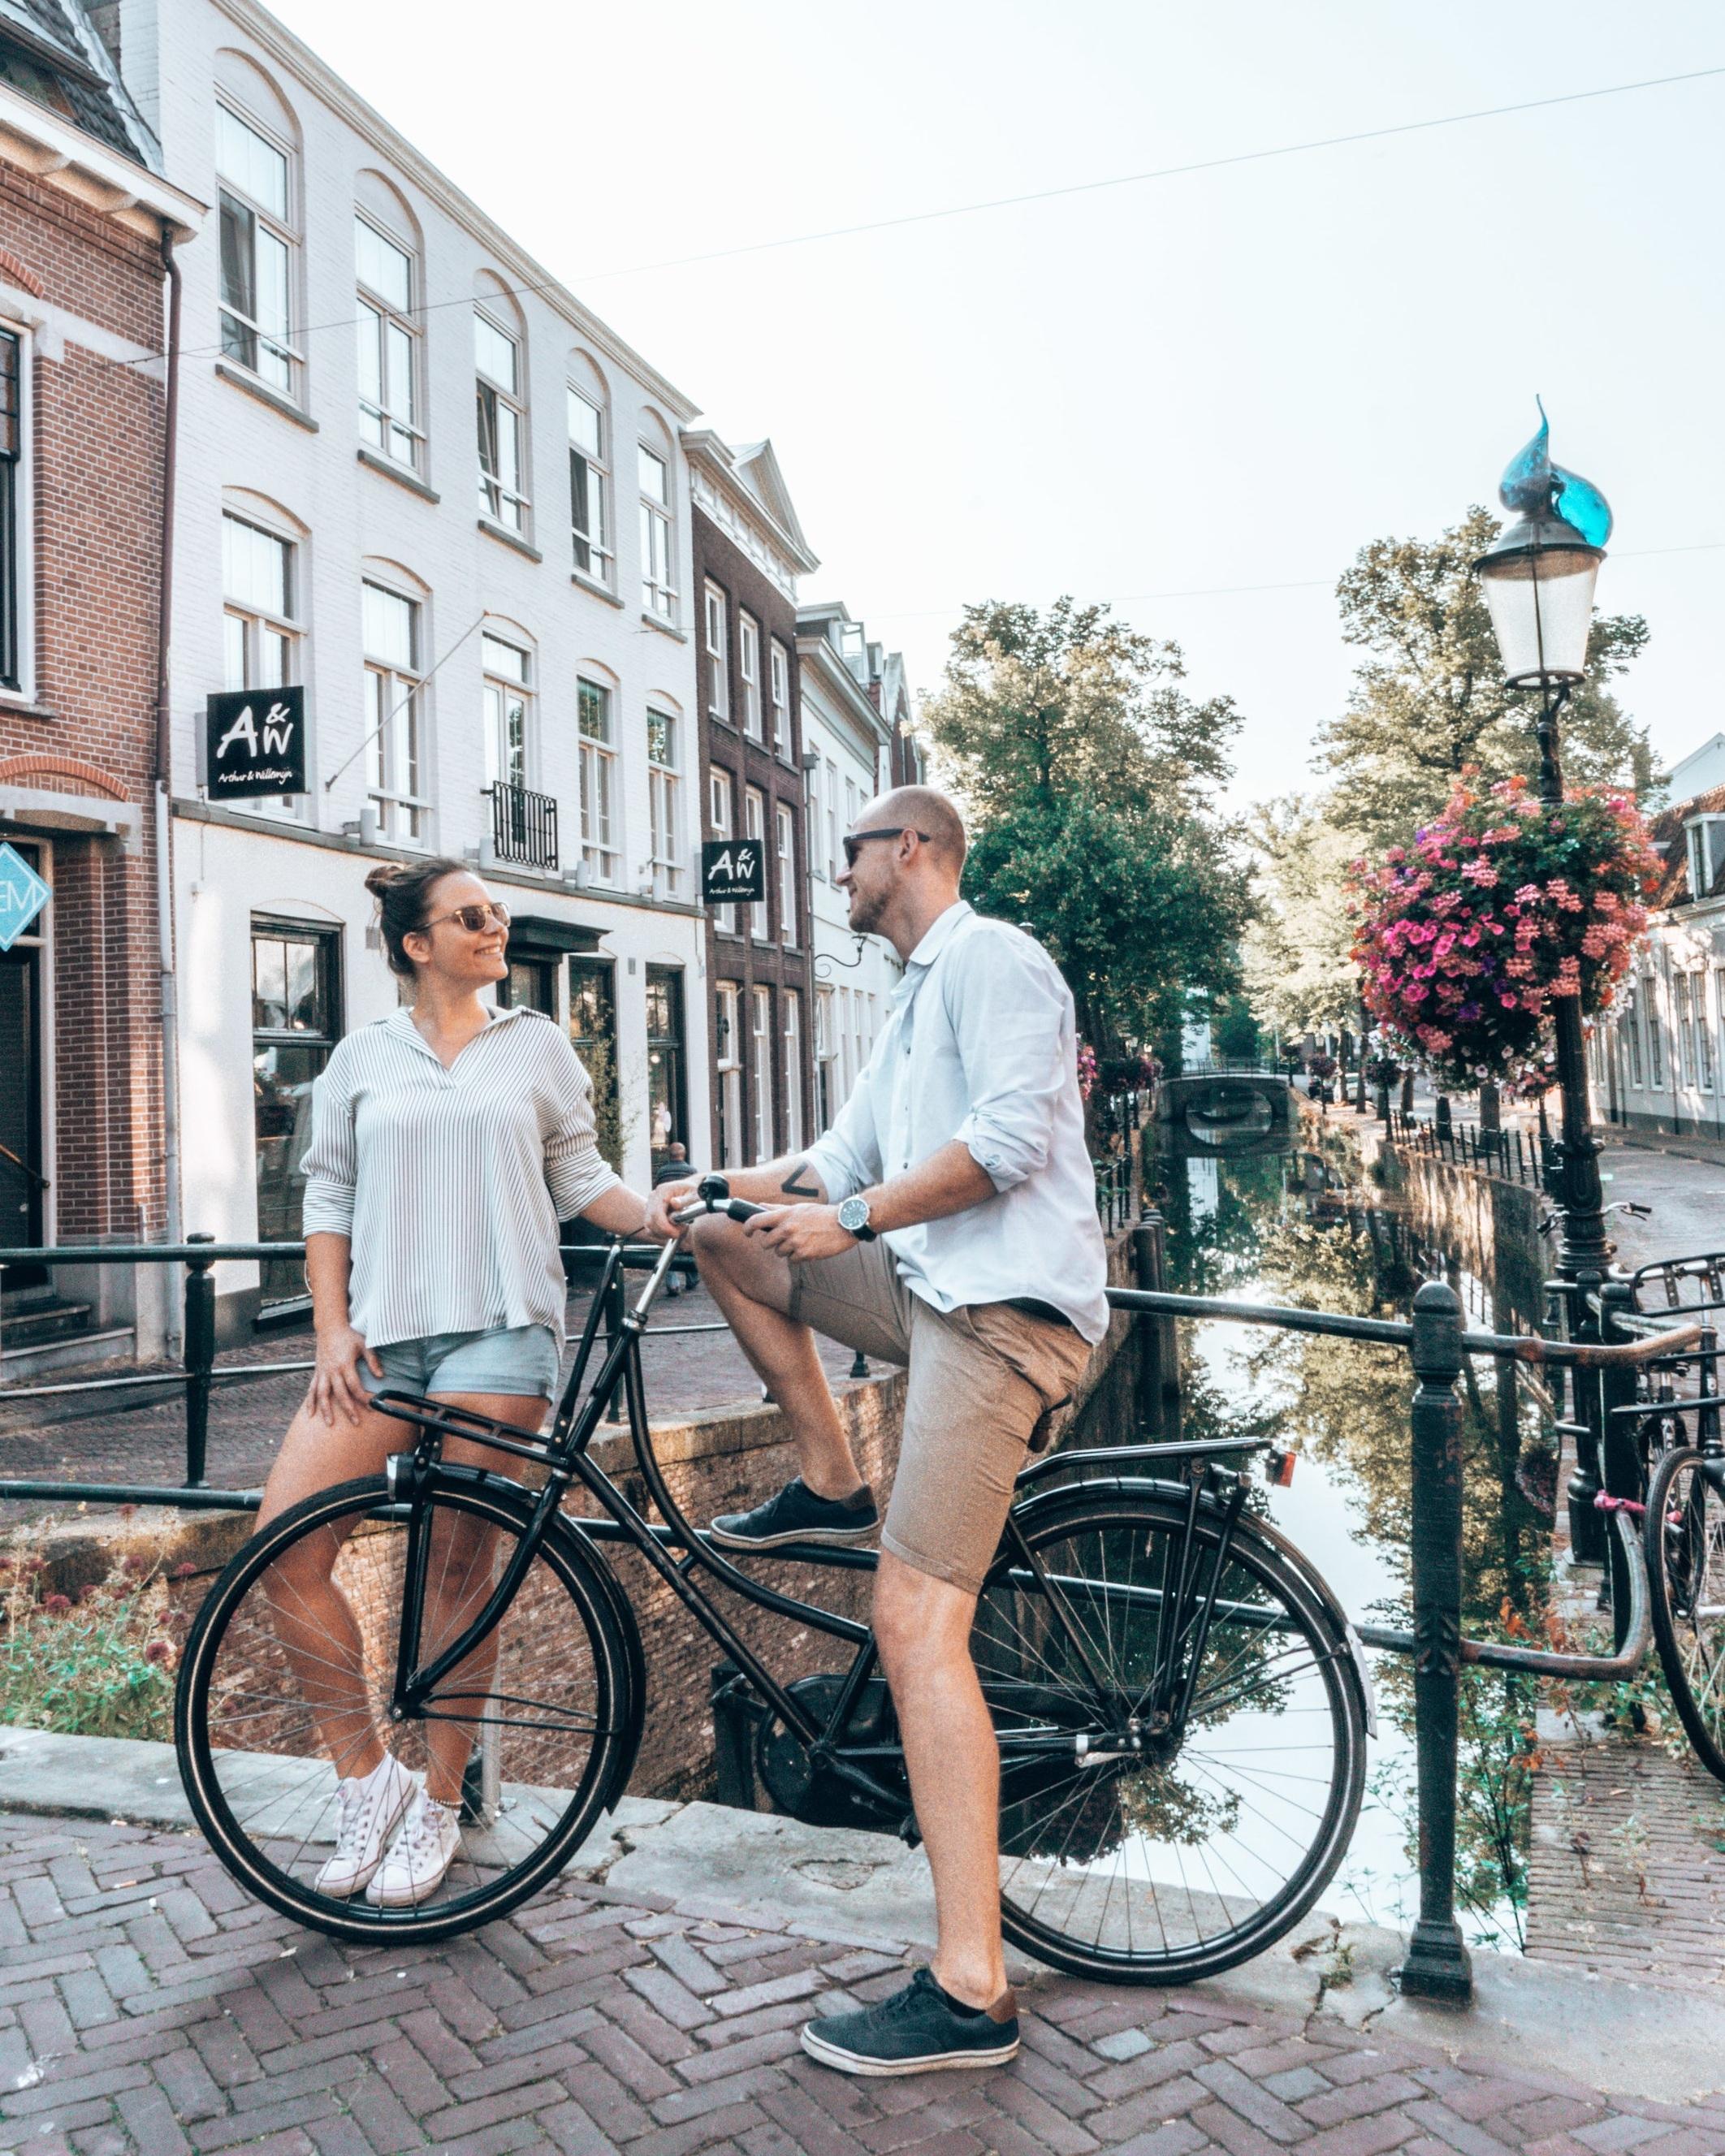 Craving Adventure - Netherlands - Amersfoort - Travel - Adventure - Couple - Canals - Blog